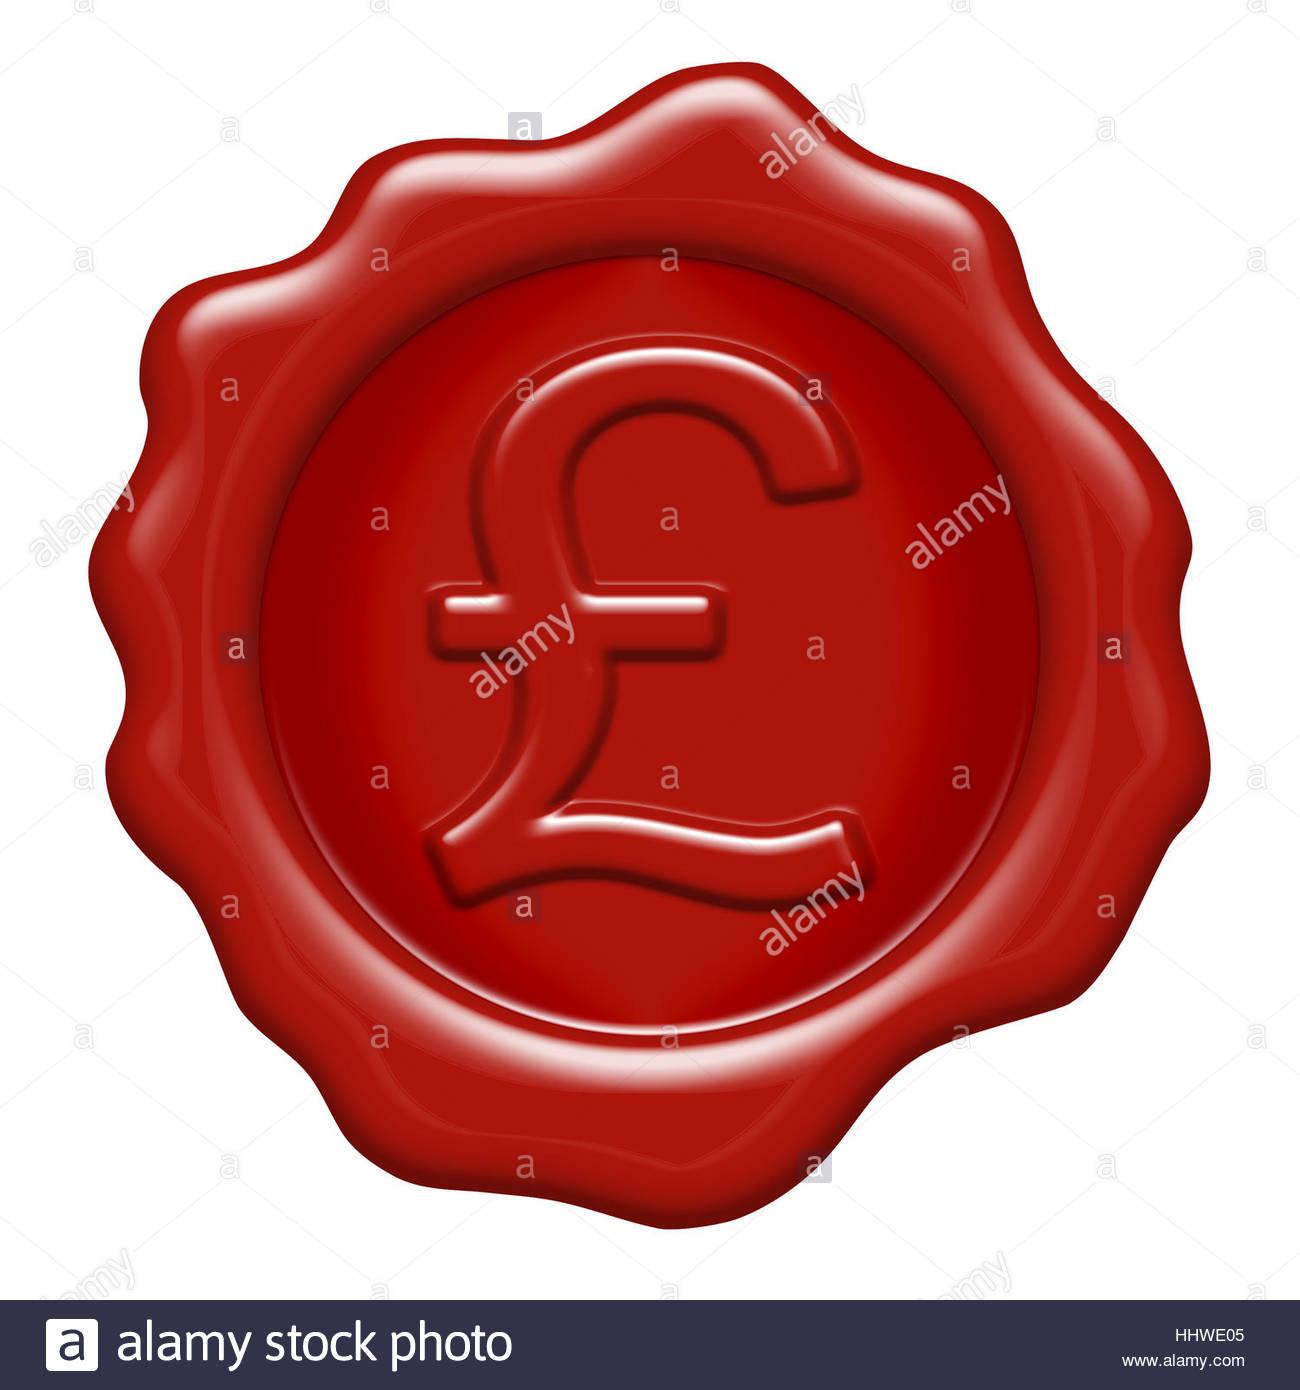 British Pound Symbol As A Wax Seal Stock Photo 131481509 Alamy